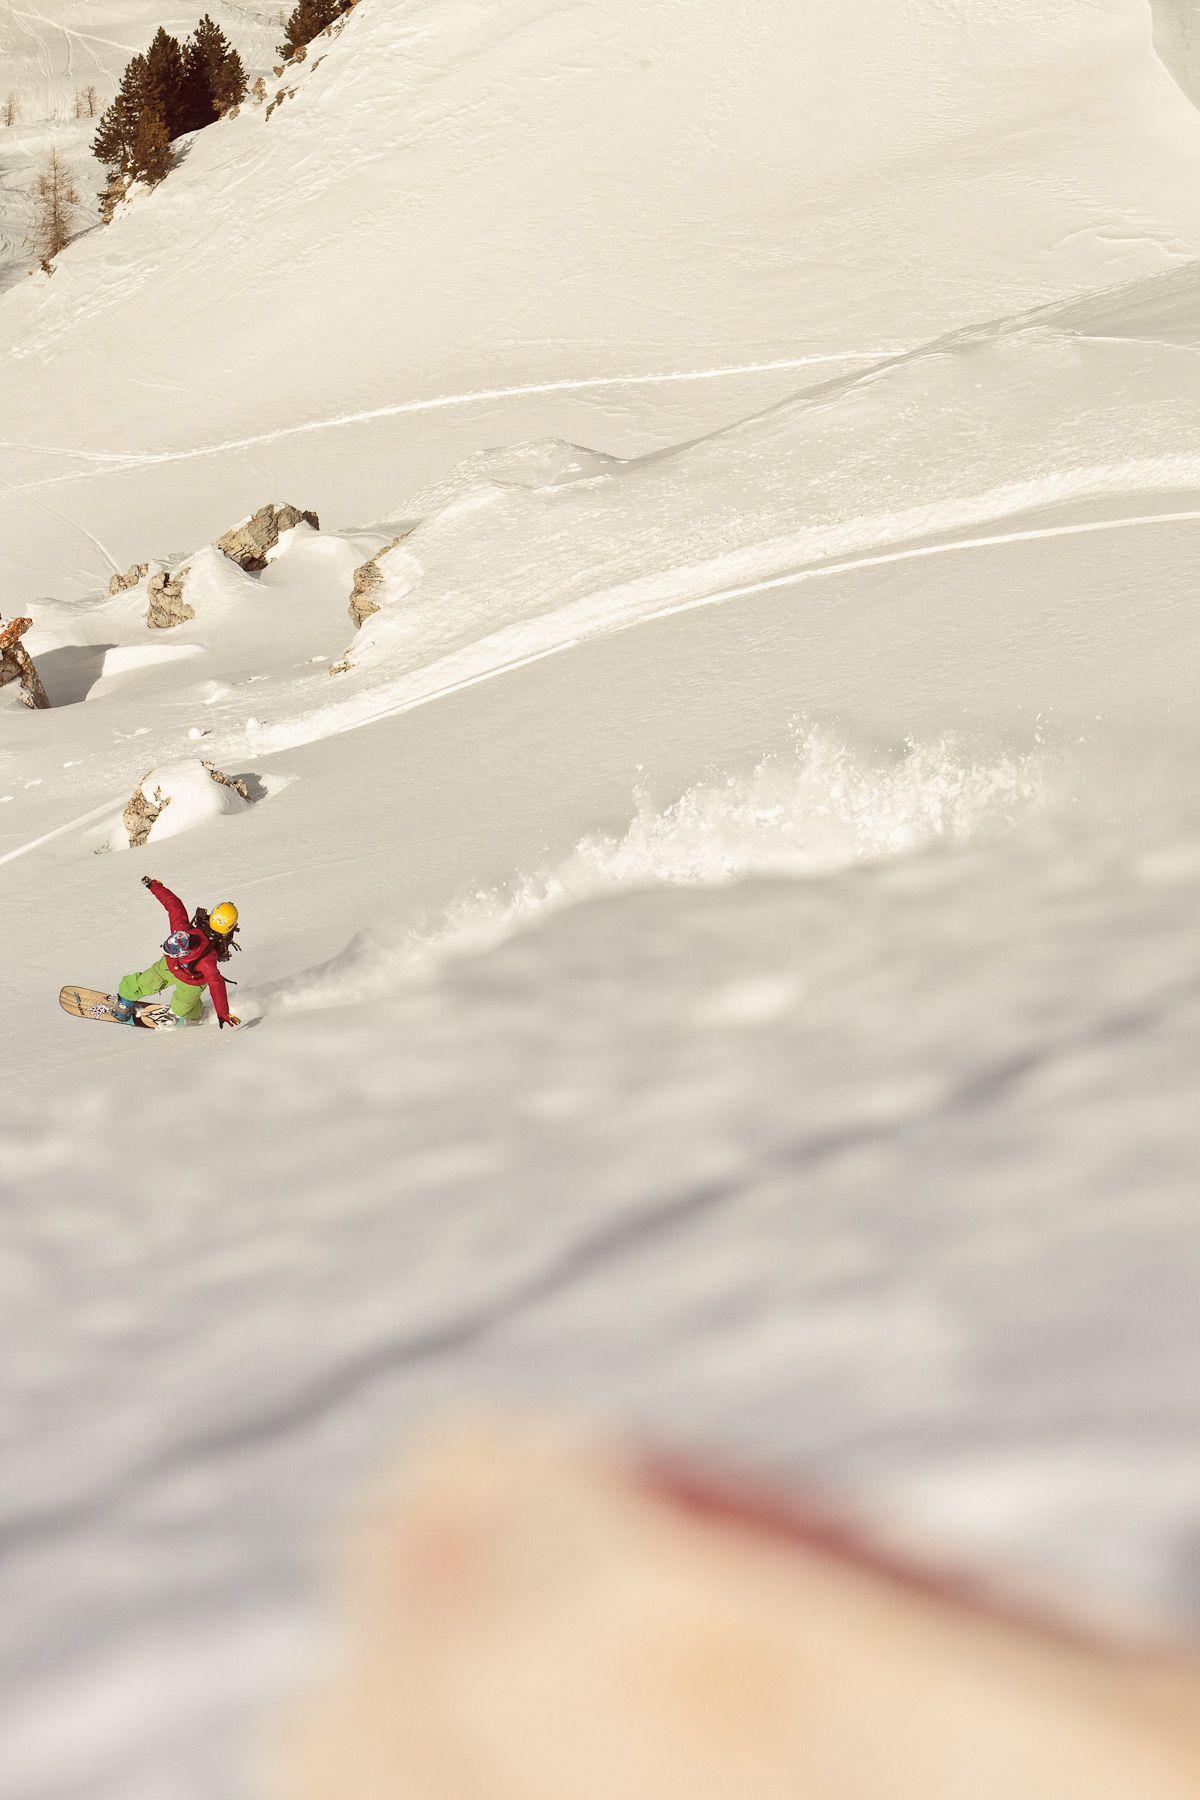 Casual powder turn. Snow surfing, Seek and destroy